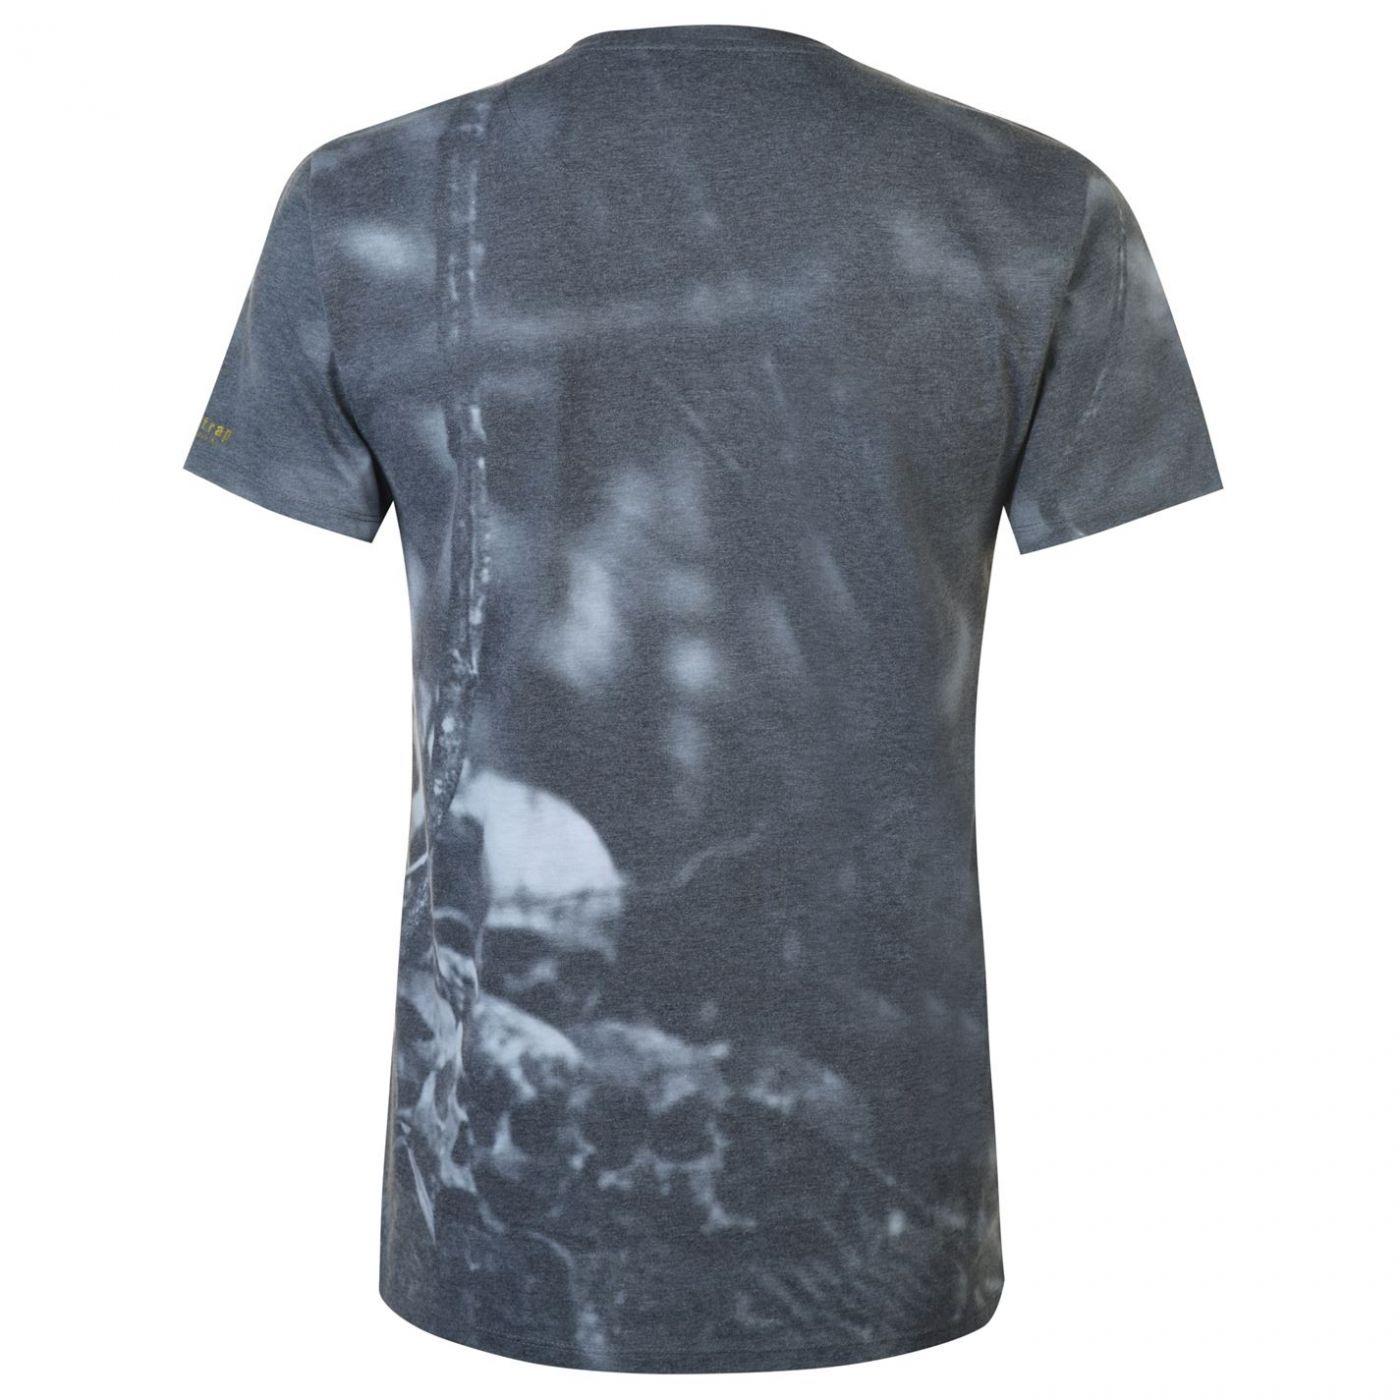 Firetrap Blackseal Sub Skull T Shirt